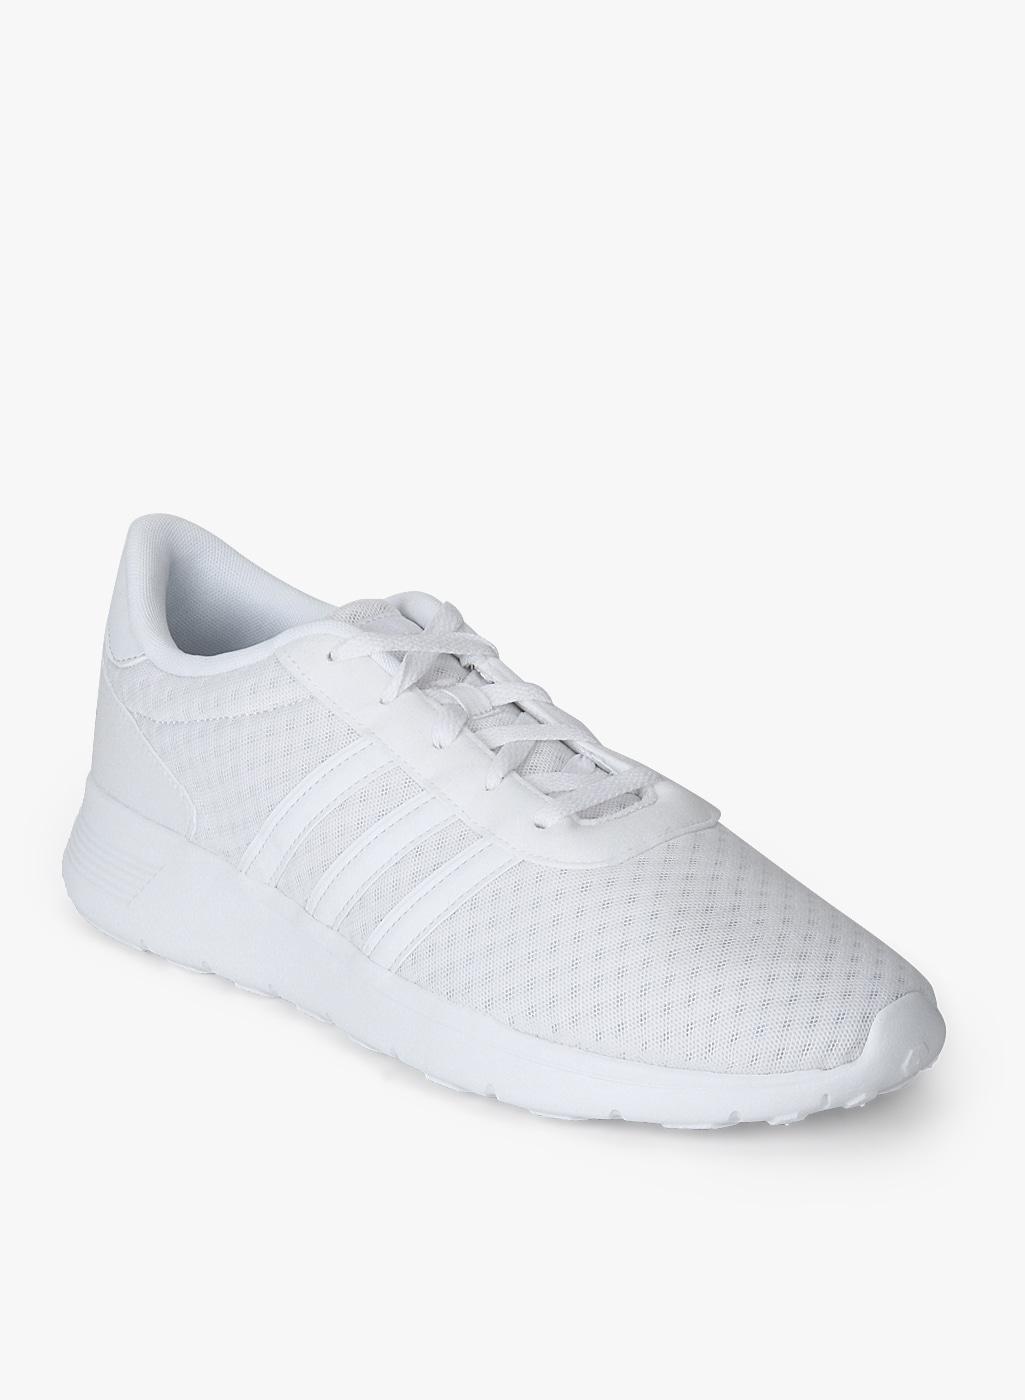 Adidas Lite - Buy Adidas Lite online in India 592ac371085e